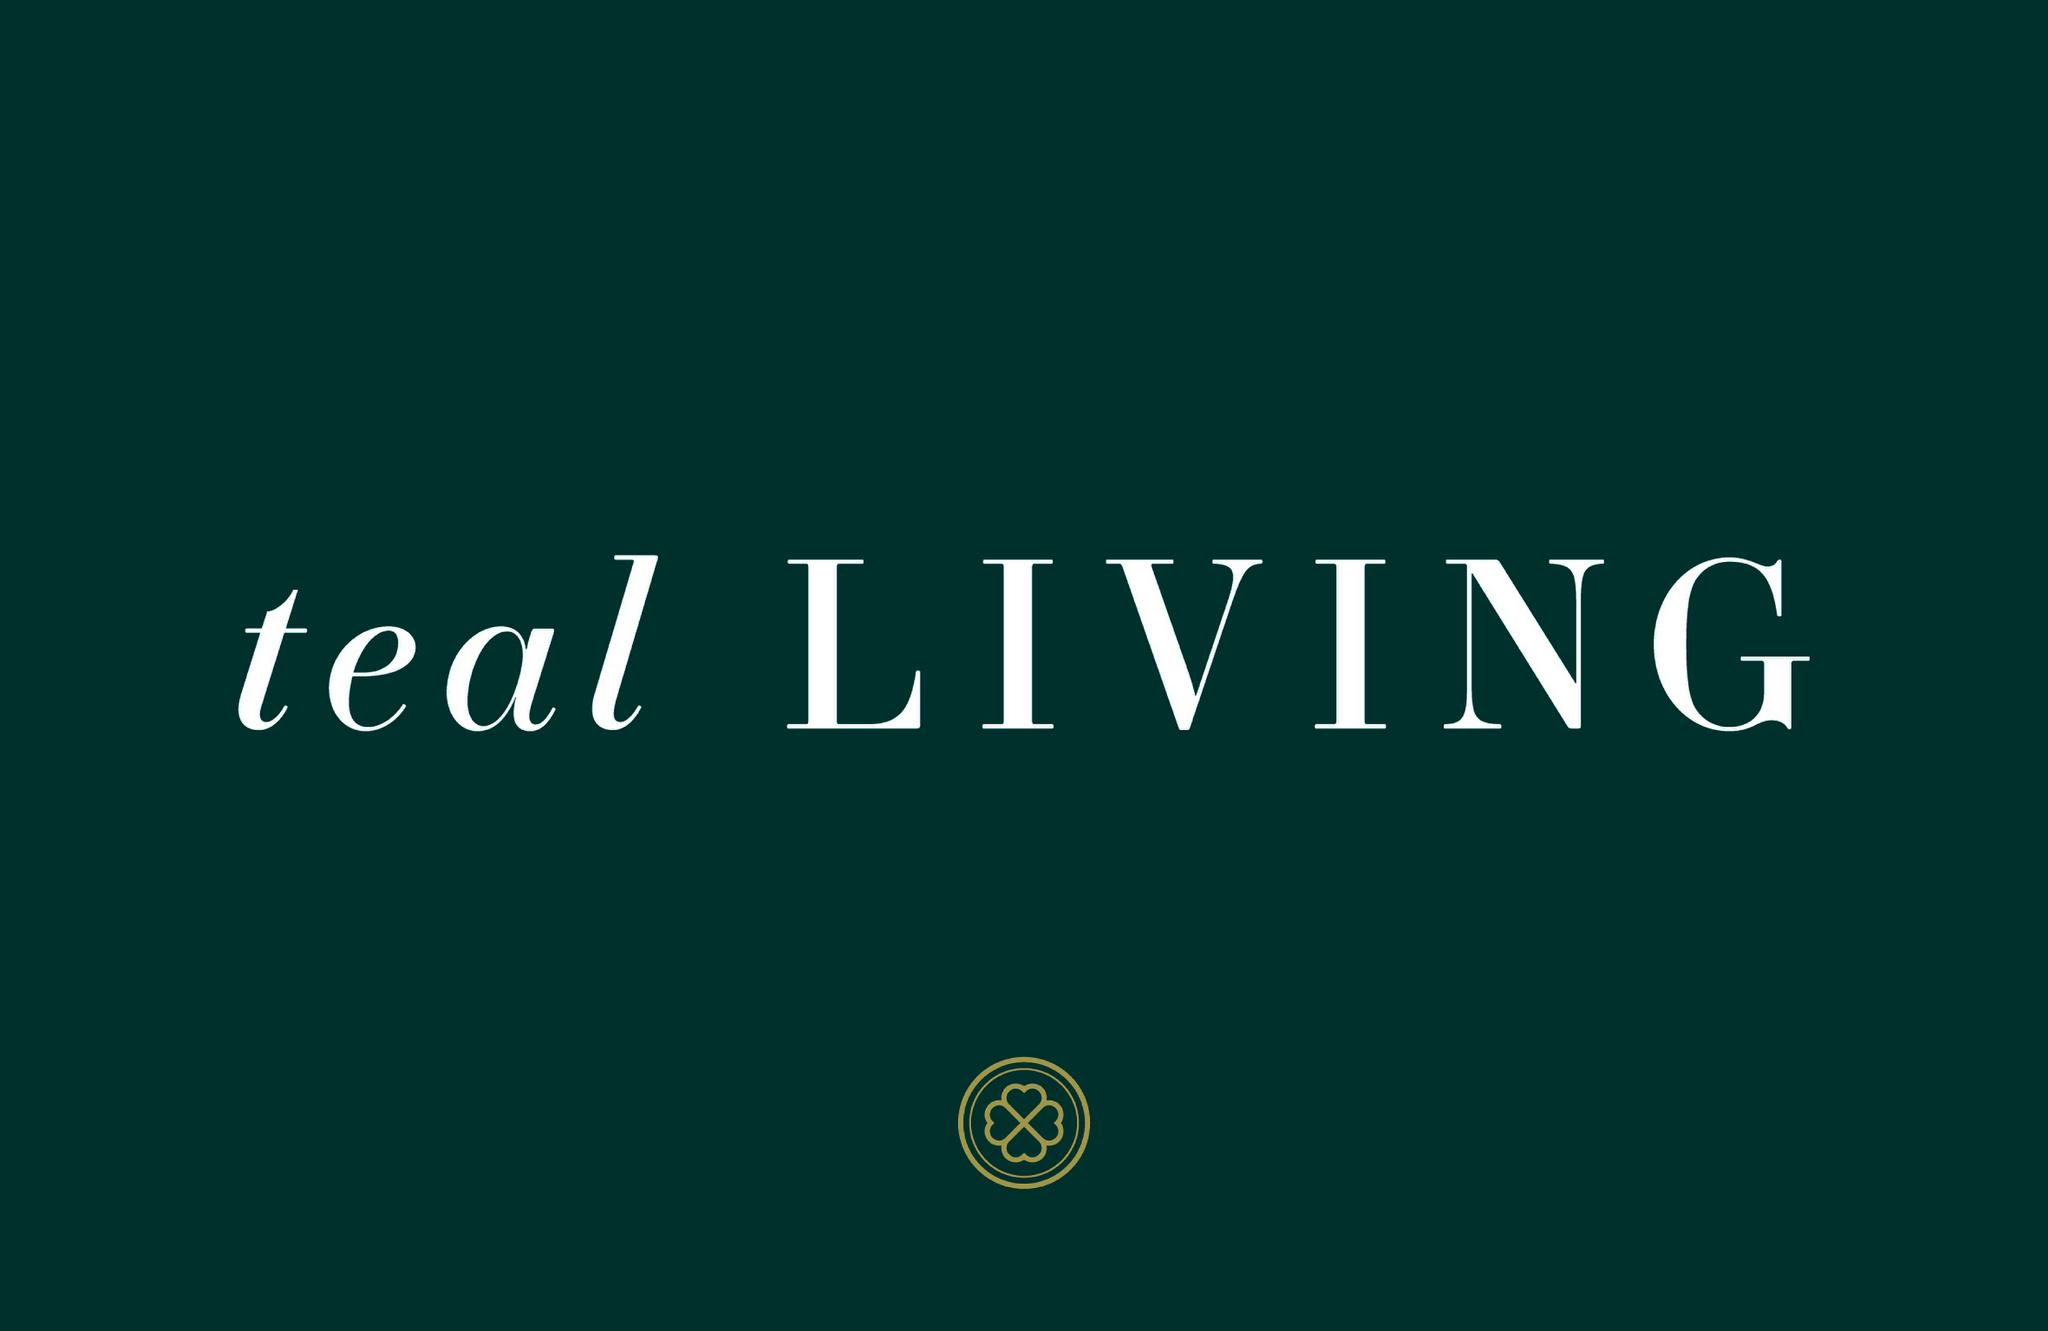 Teal Living